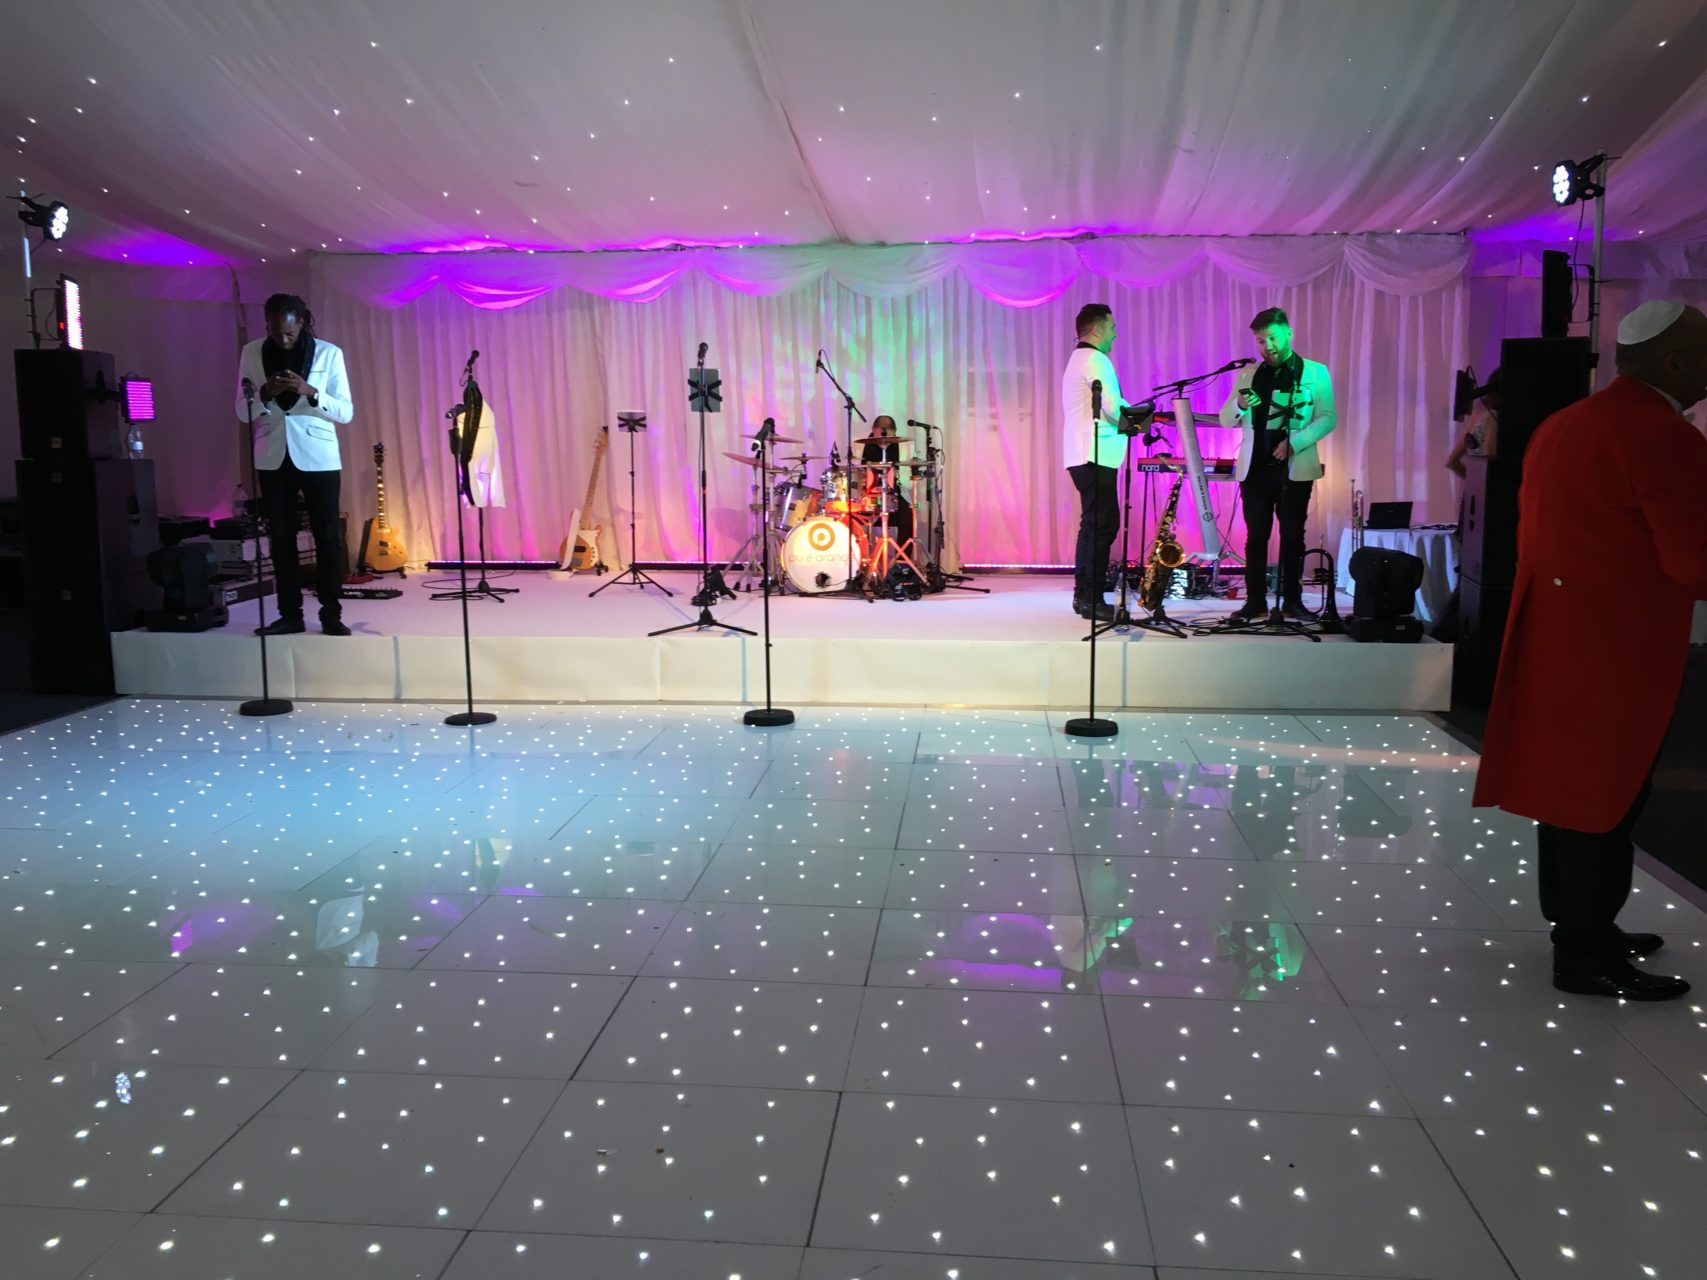 Wedding Production at Luton Hoo Walled Garden